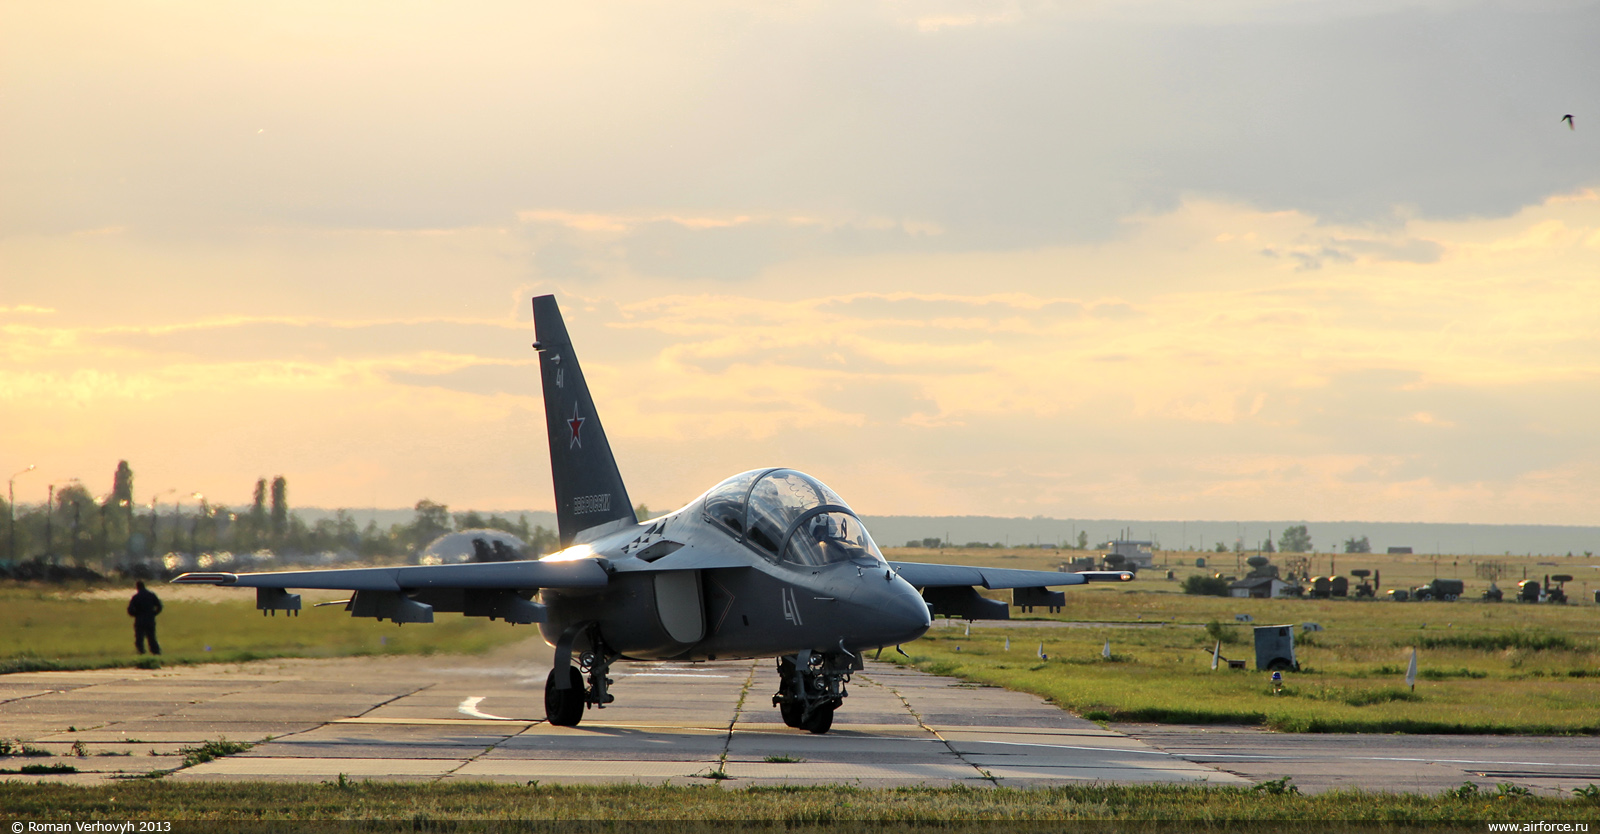 Rostec: Jato de treinamento russo YAK-130 poderá incorporar equipamentos brasileiros